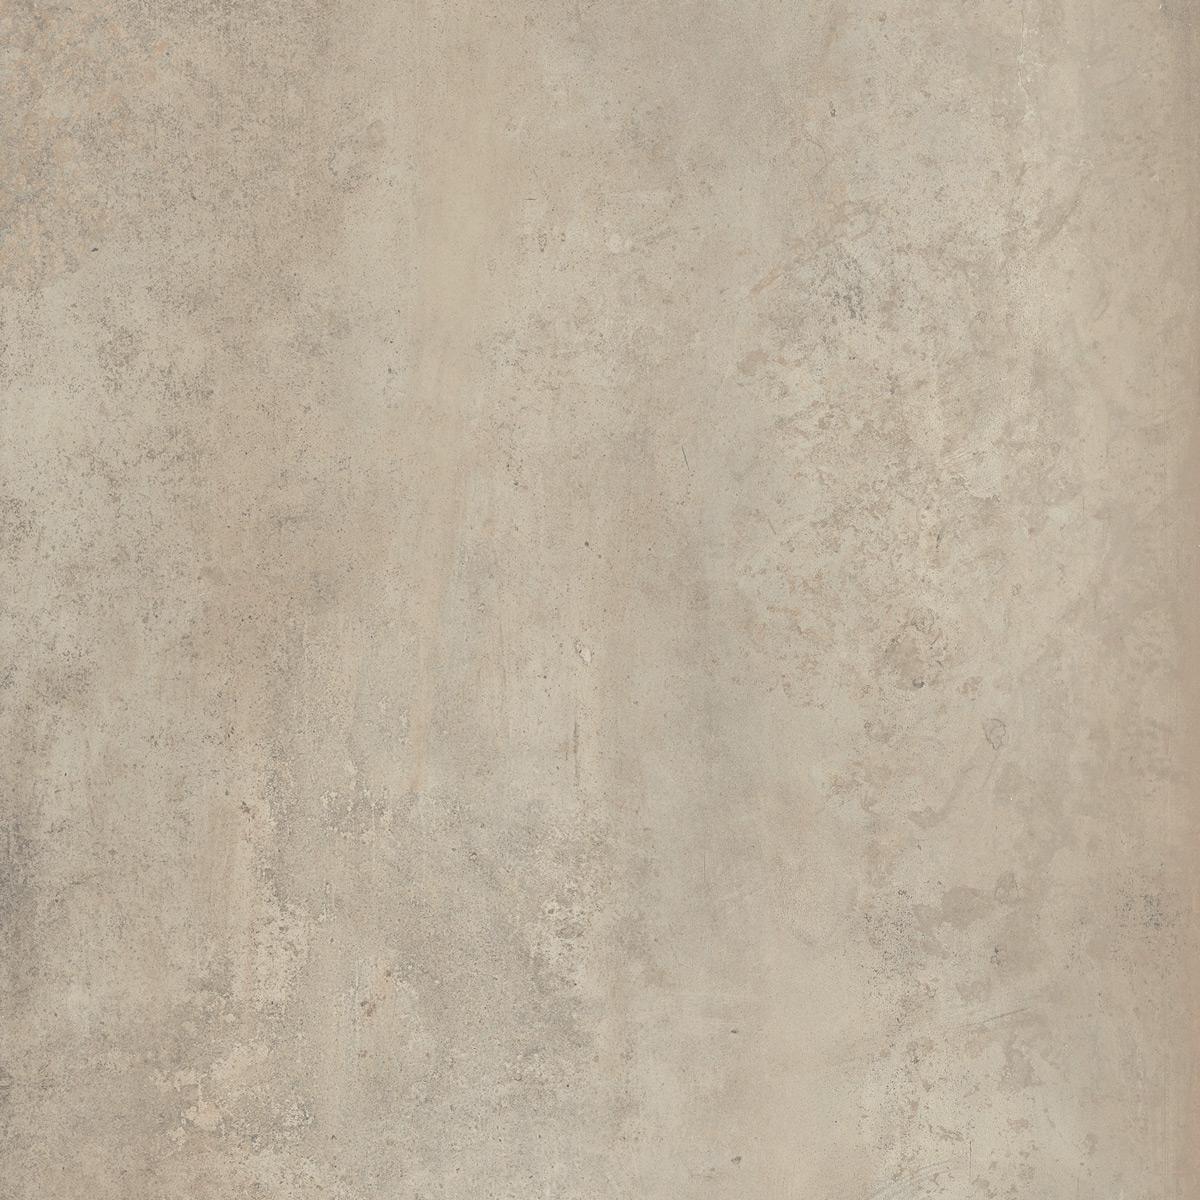 Castelvetro Materika Grigio Terrassenplatte CA-XMK10R4 100x100 MATT